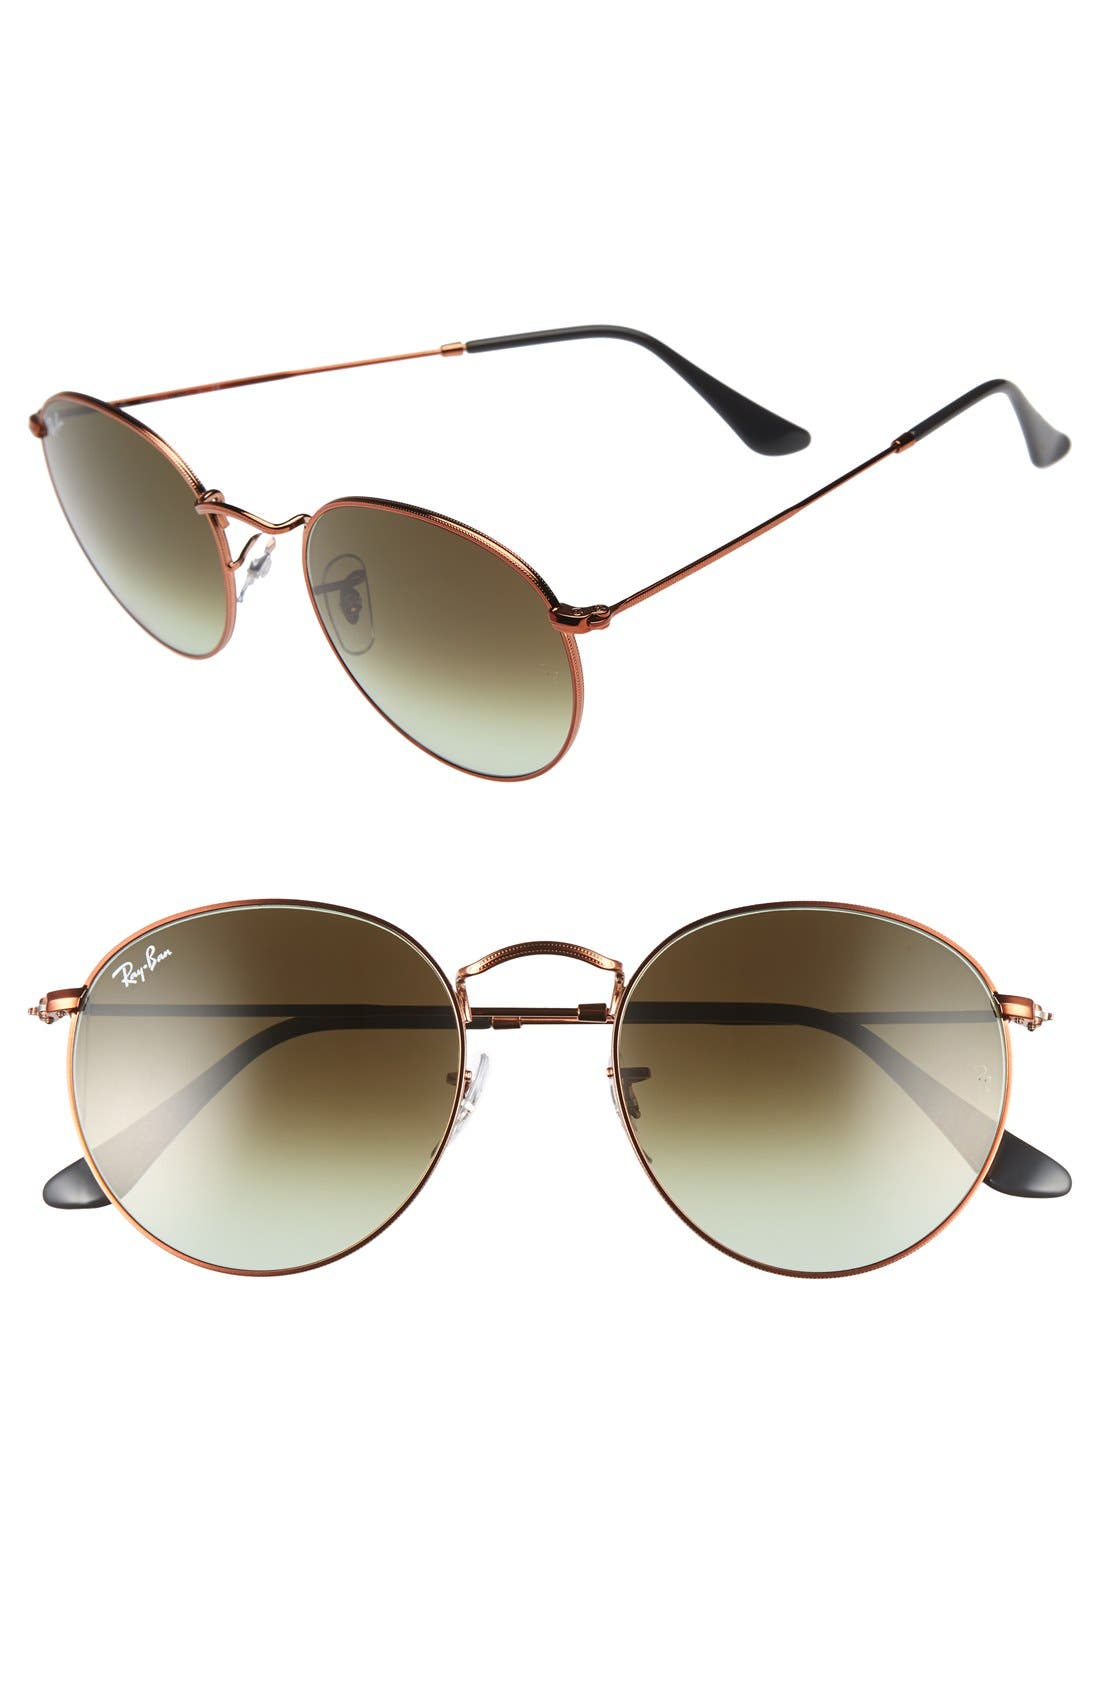 Icons 53mm Retro Sunglasses,                         Main,                         color, Green/ Brown